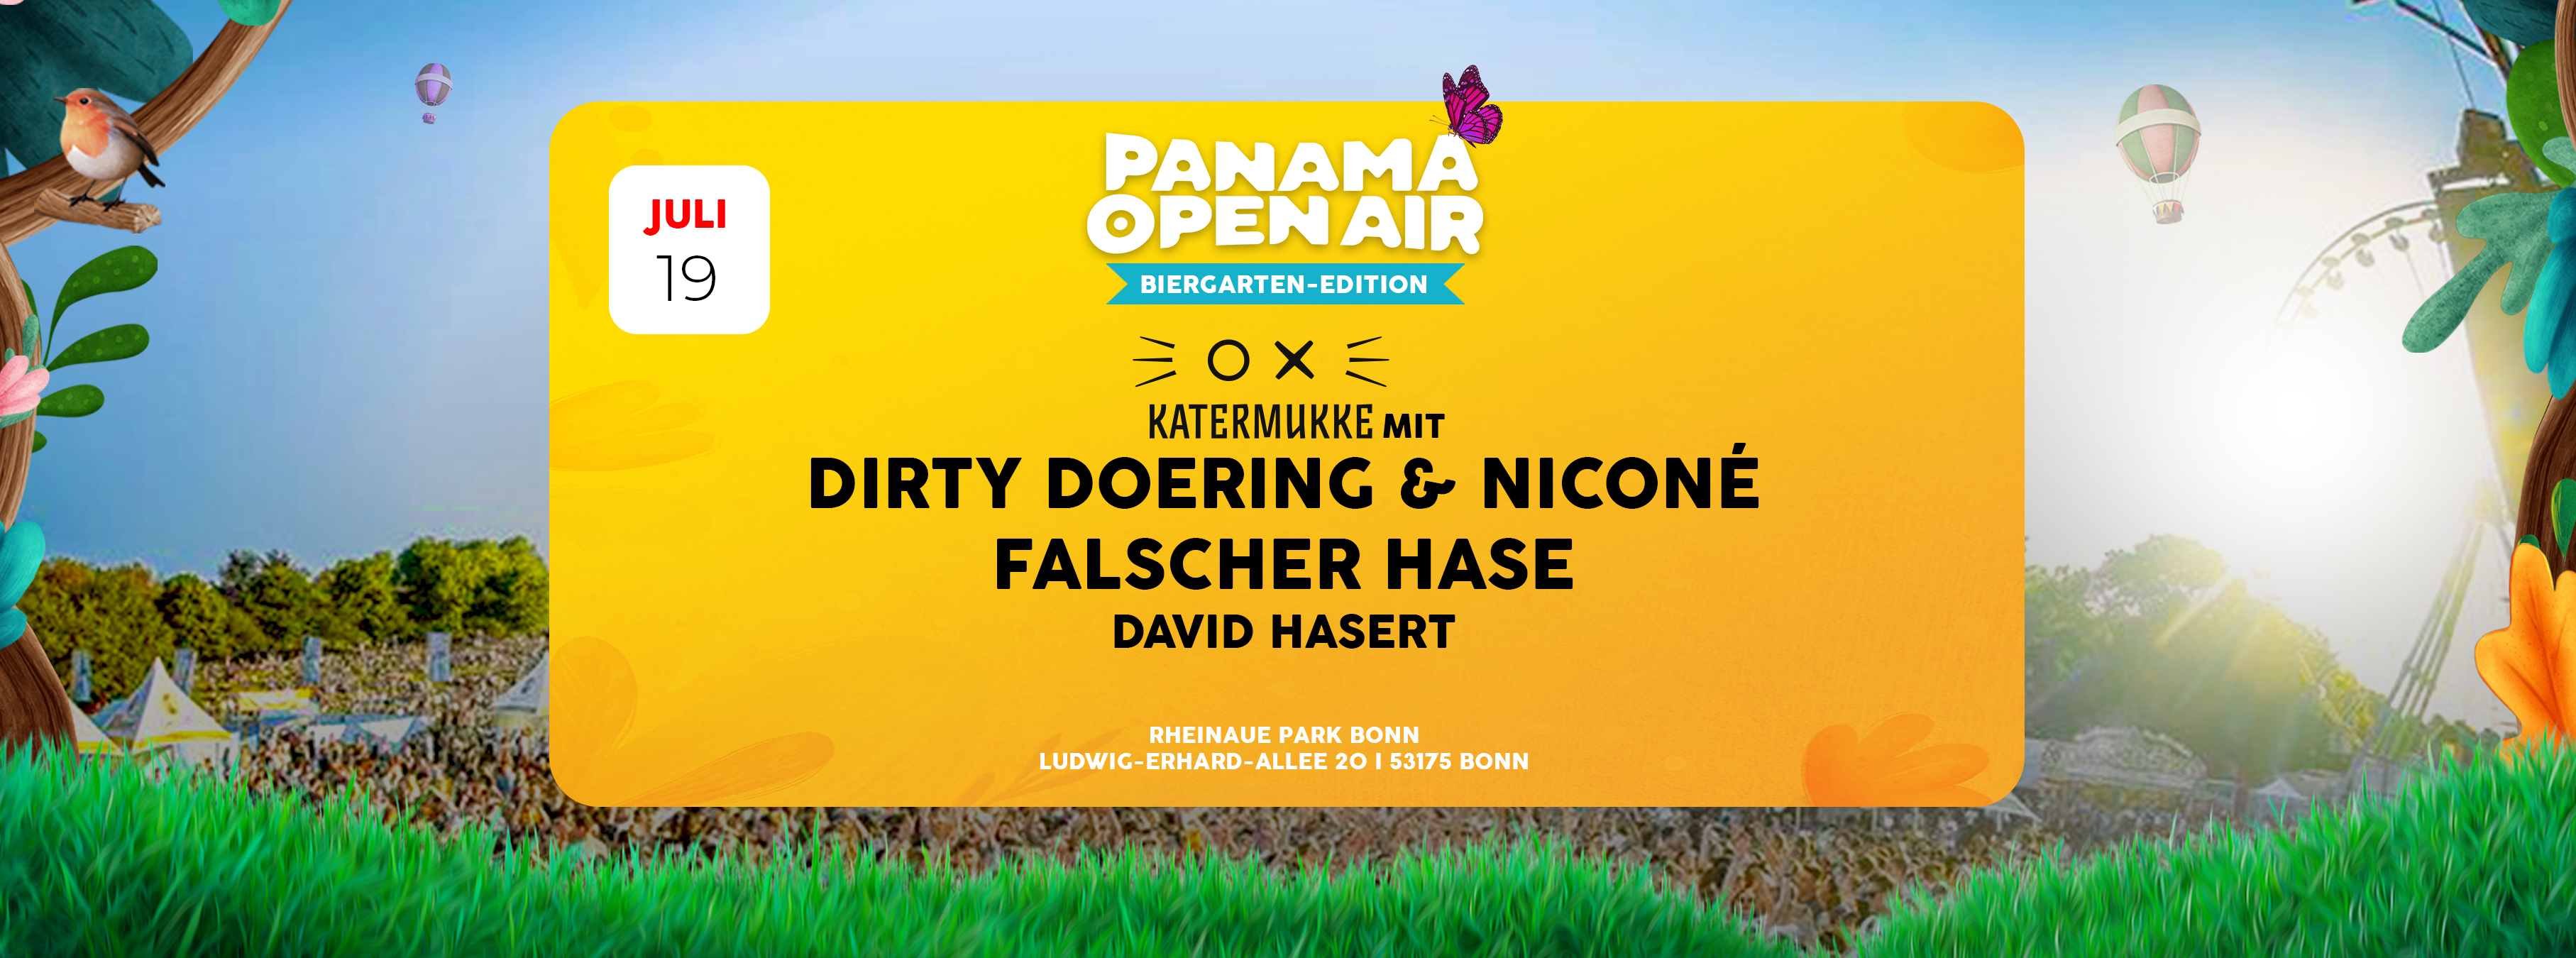 Tickets Fur Panama Open Air Biergarten Edition W Katermukke Falscher Hase Vivenu